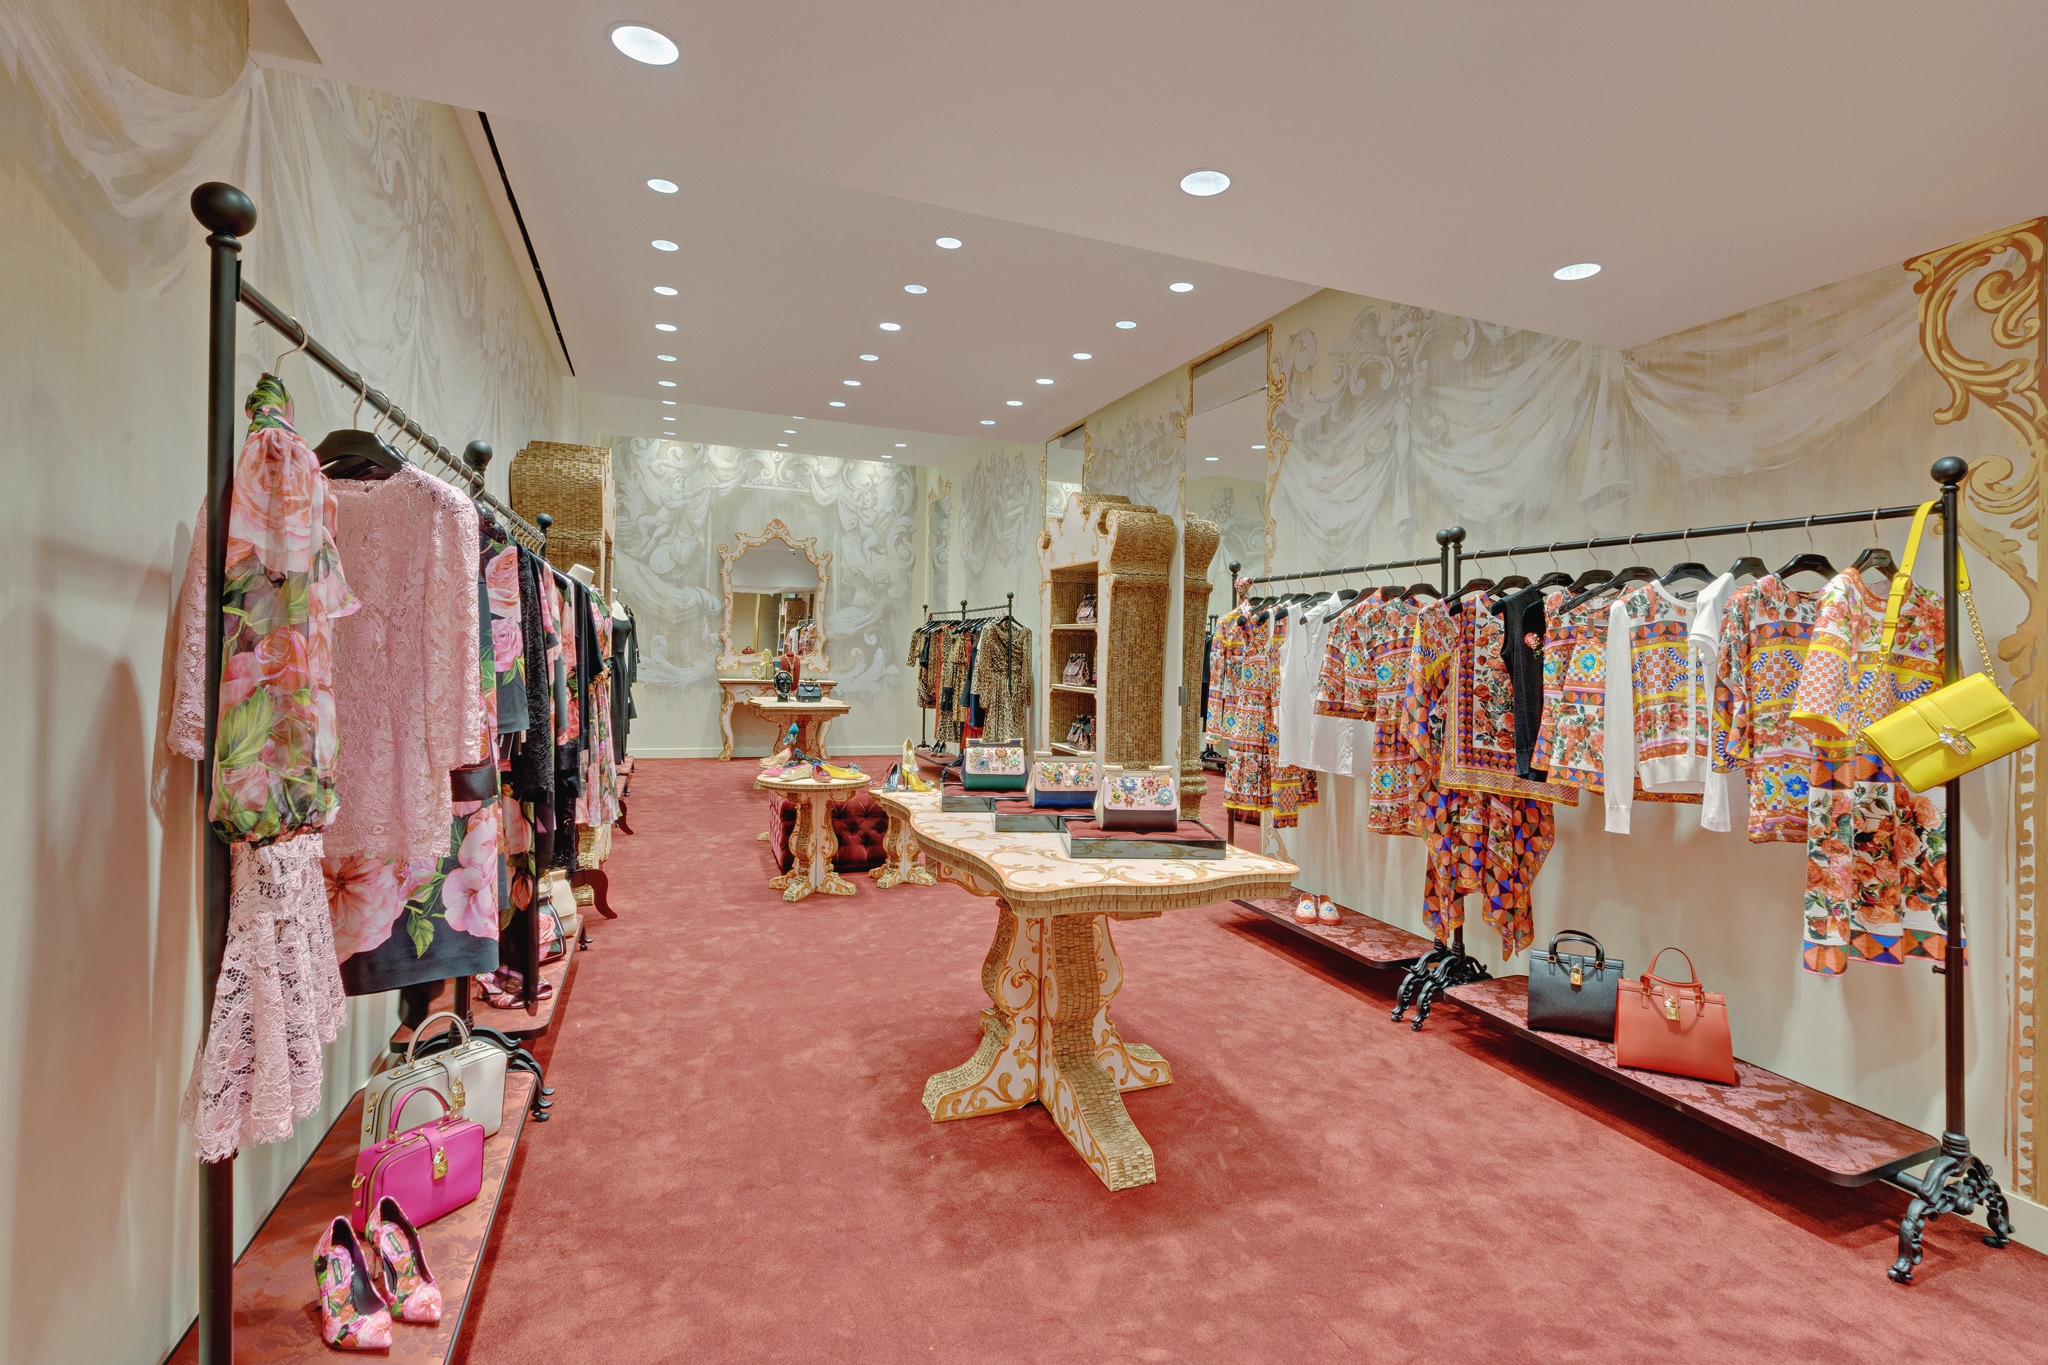 20170123 - Dolce & Gabbana - HCM - Commercial - Interior - Store - Retouch 0002.jpg